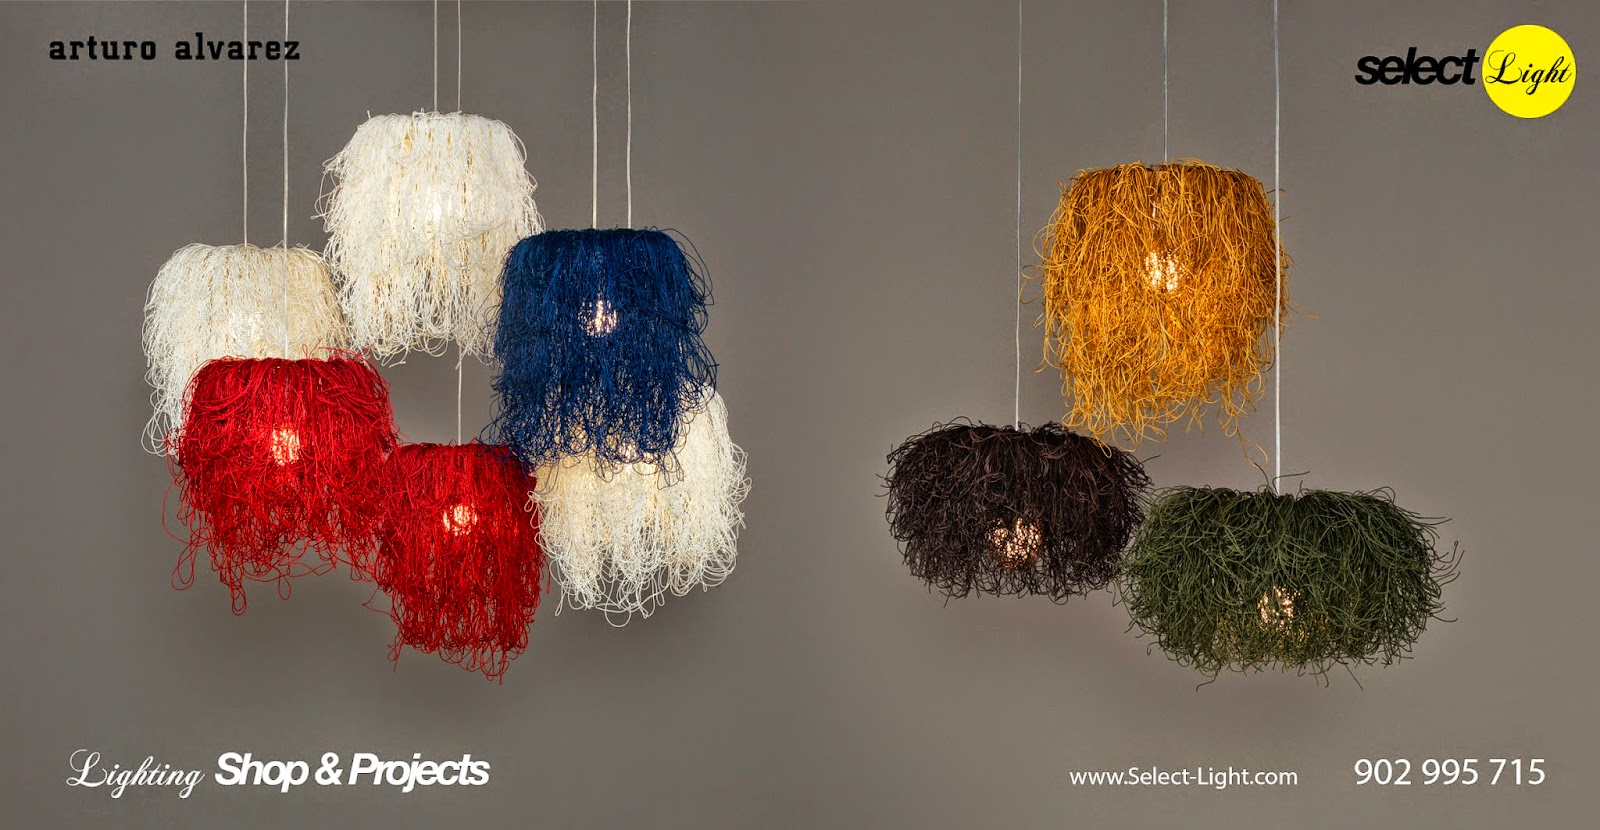 Caos Lamp - designer Arturo Álvarez